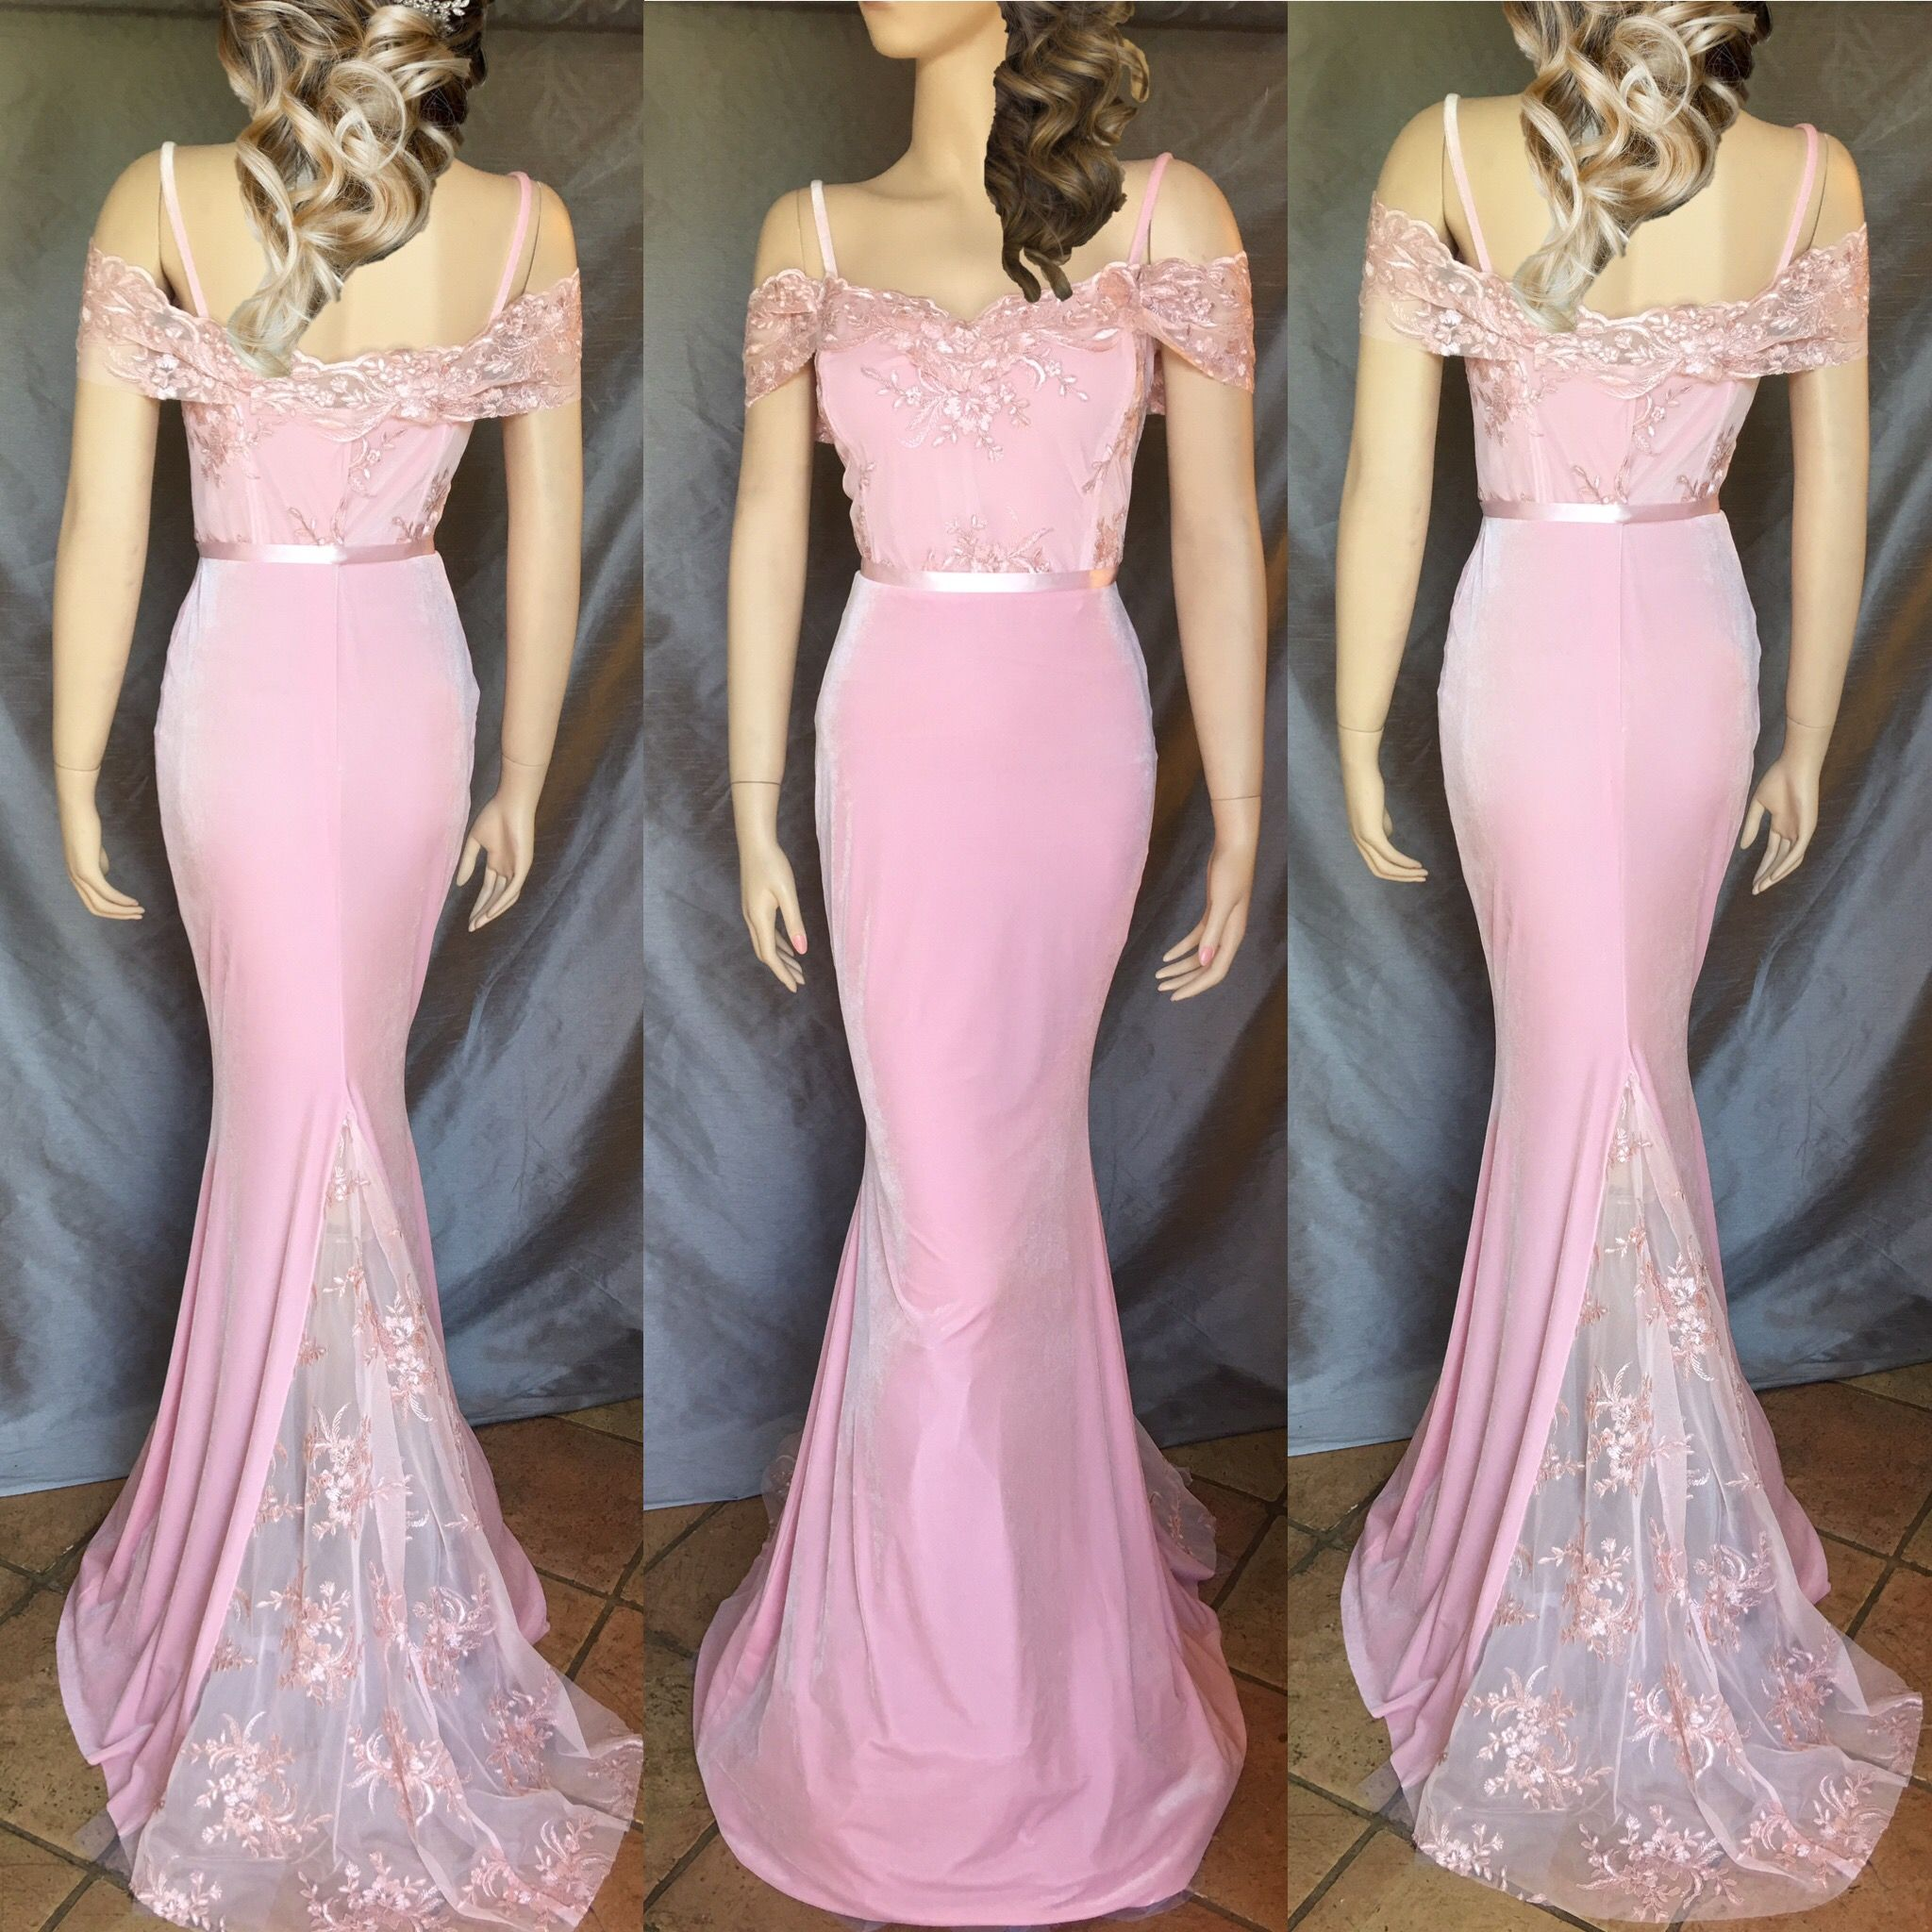 Lace Mermaid Style Bridesmaids Dress Prom Dress Open Back Handmade ...